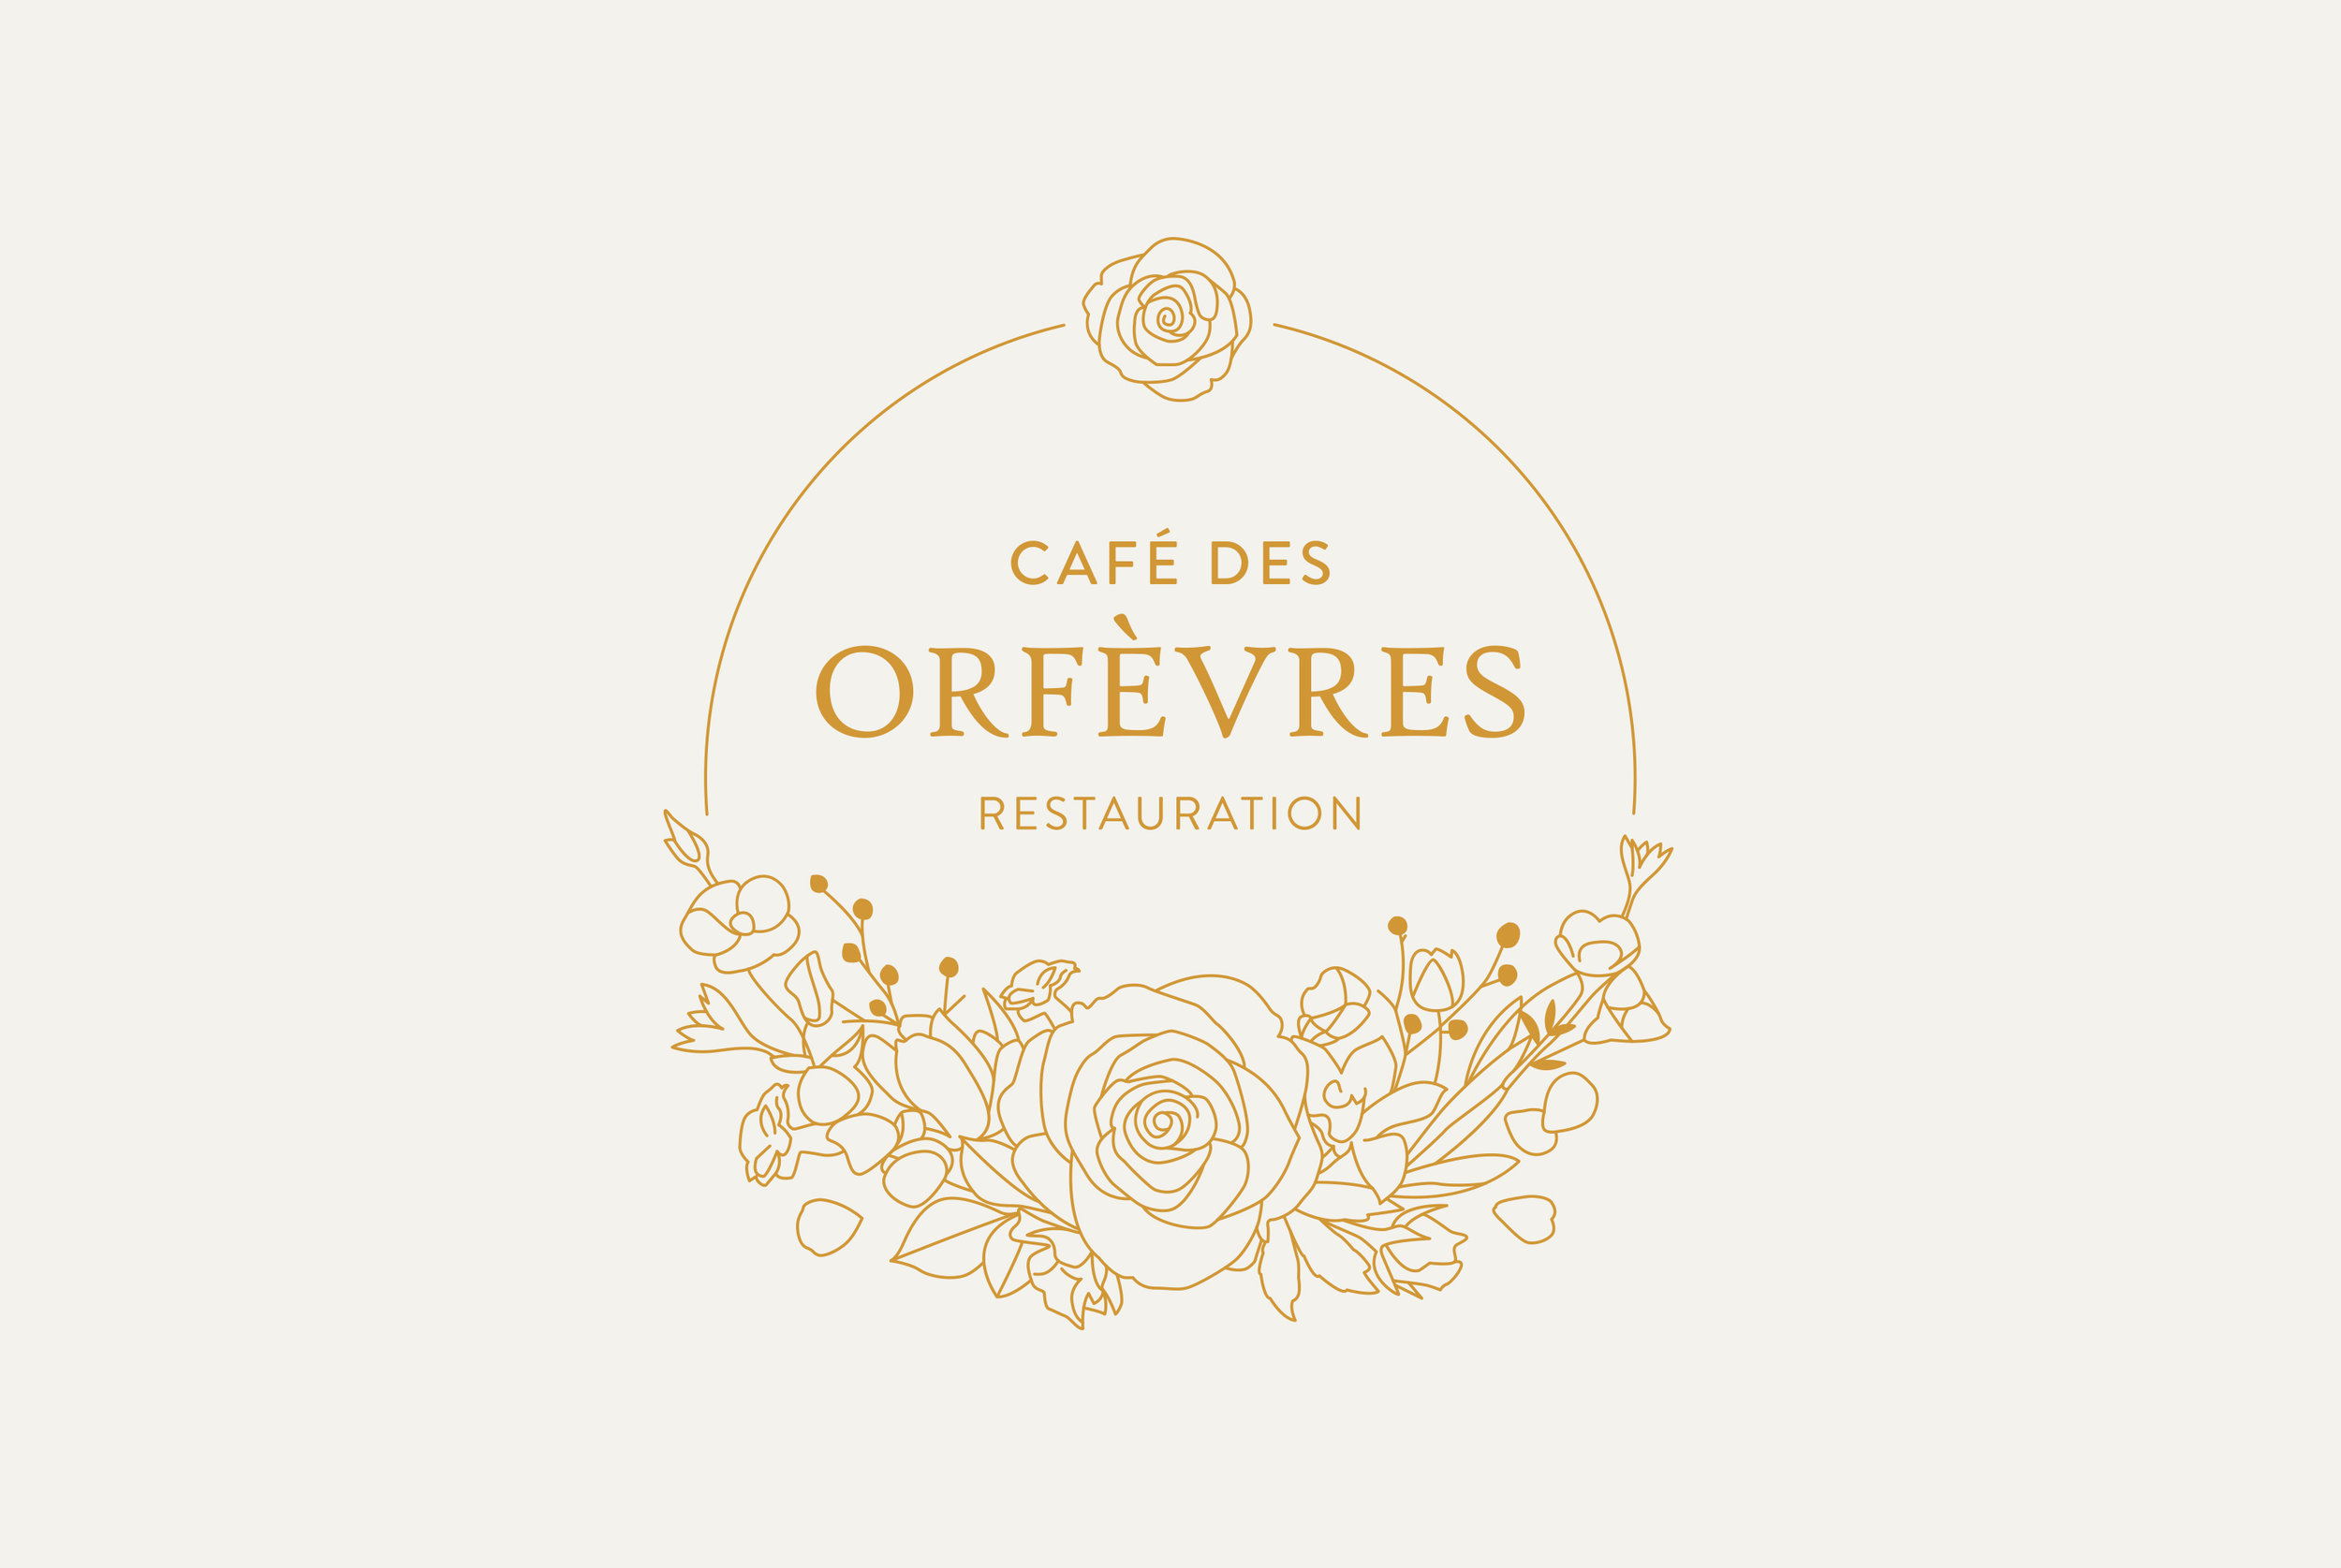 Carole_Chevalier-CafeDesOrfevres.jpg